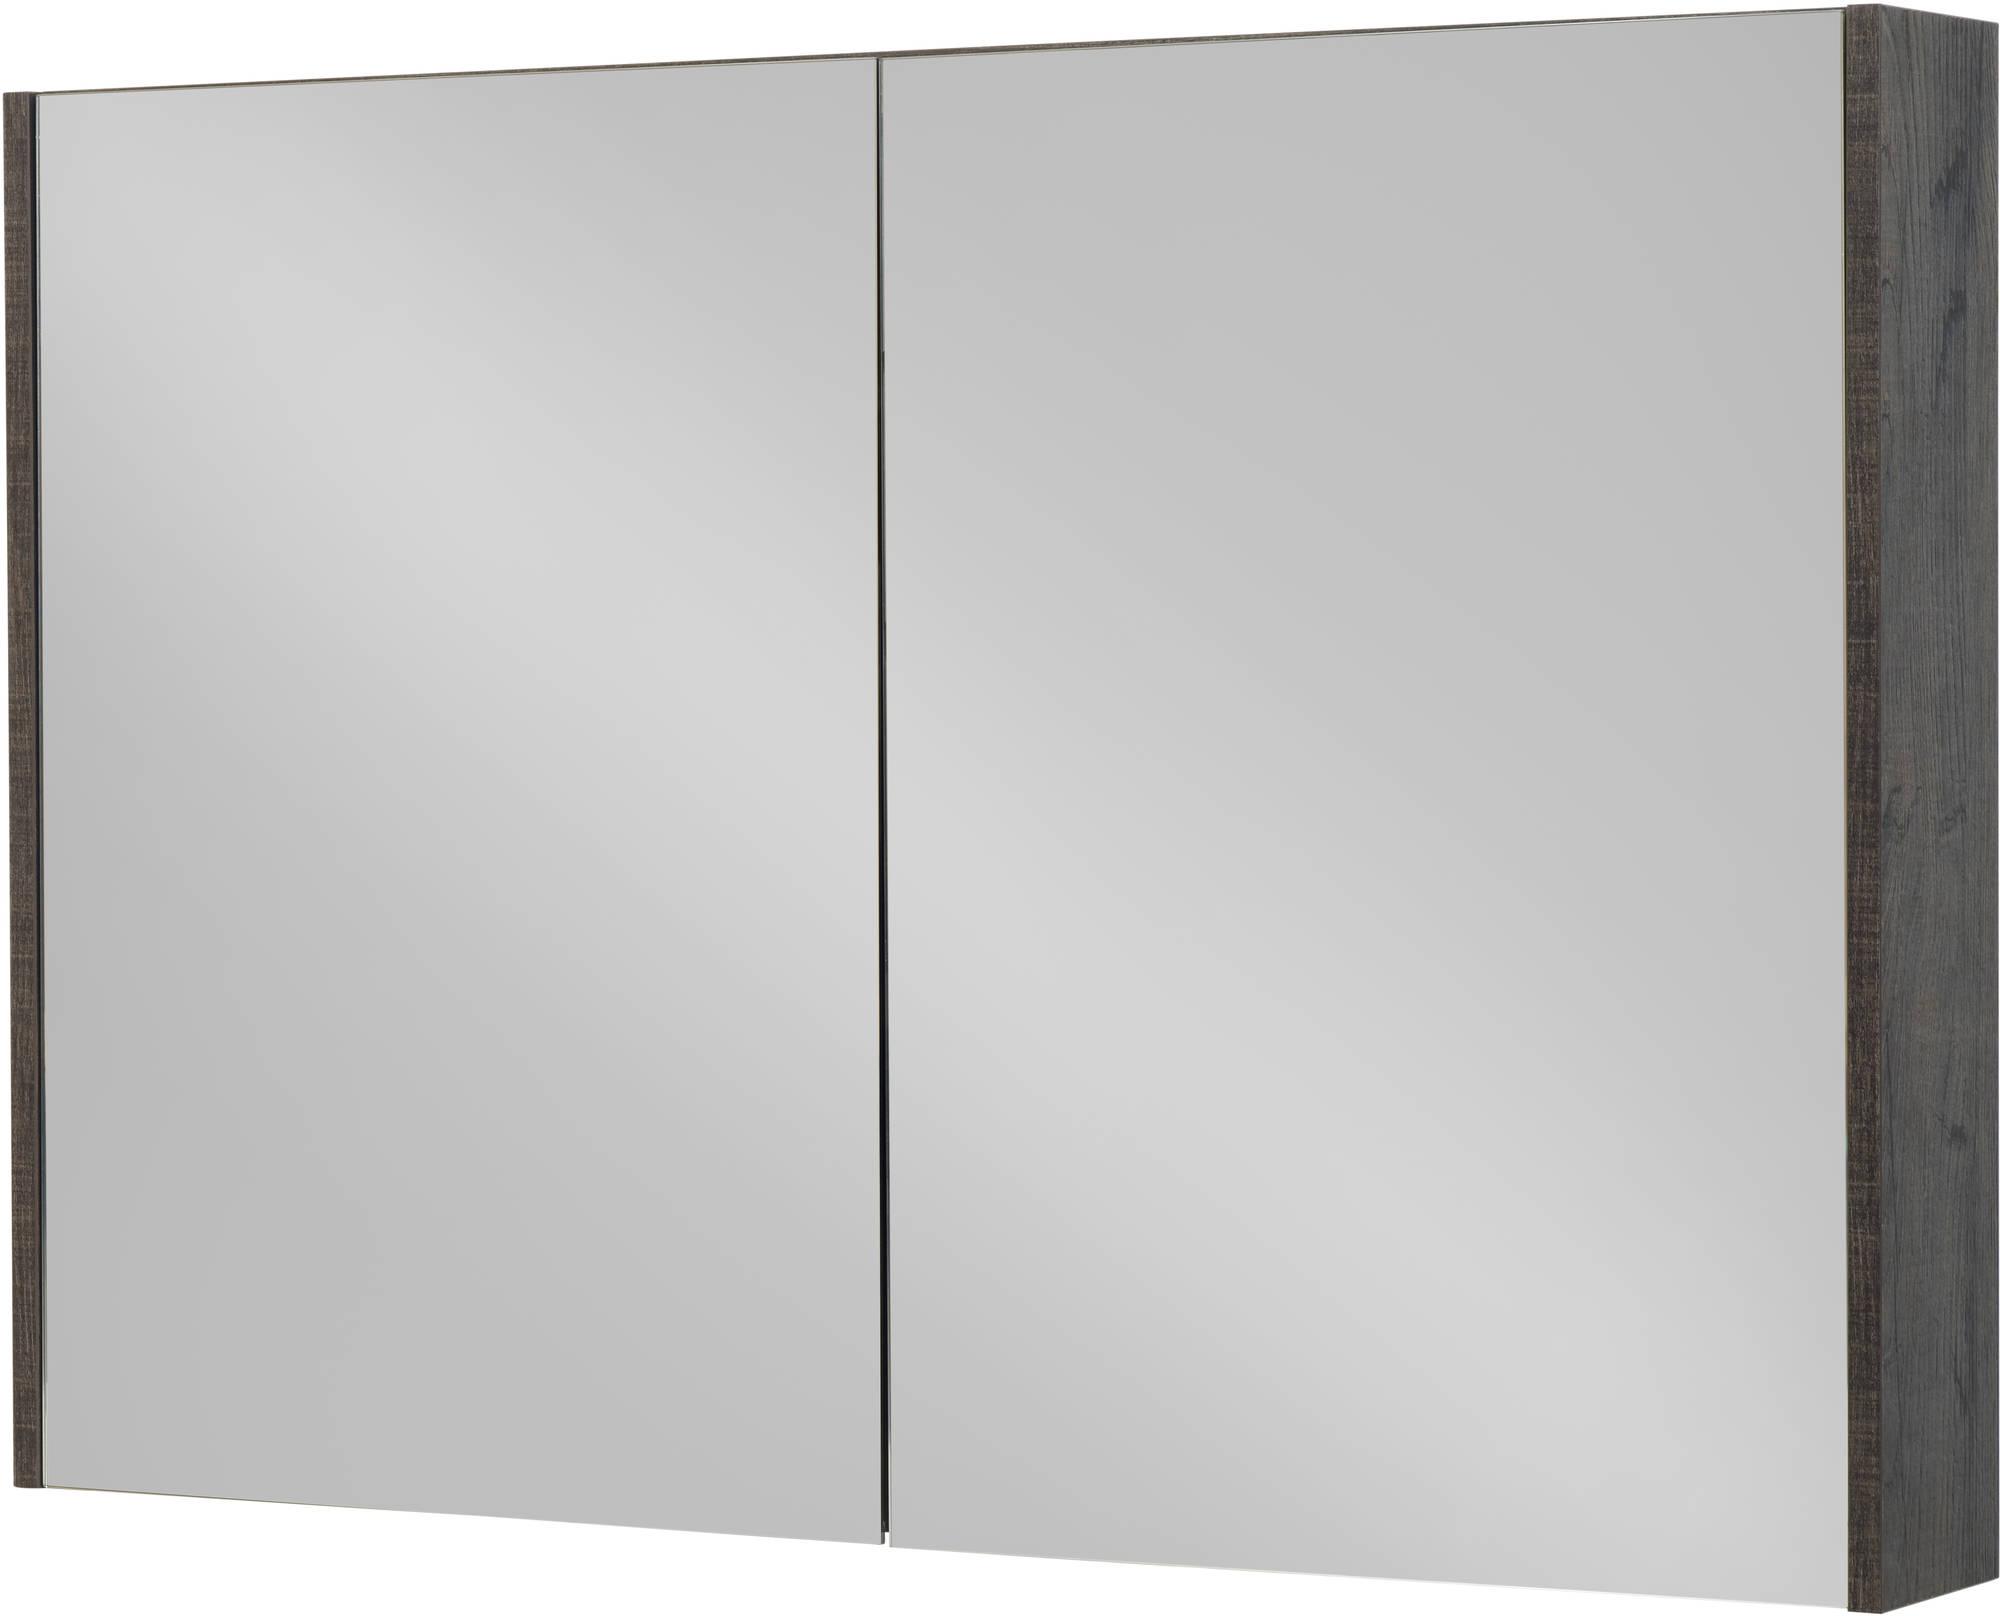 Saniselect Socan Spiegelkast 100x14x70 cm Kasteel Bruin